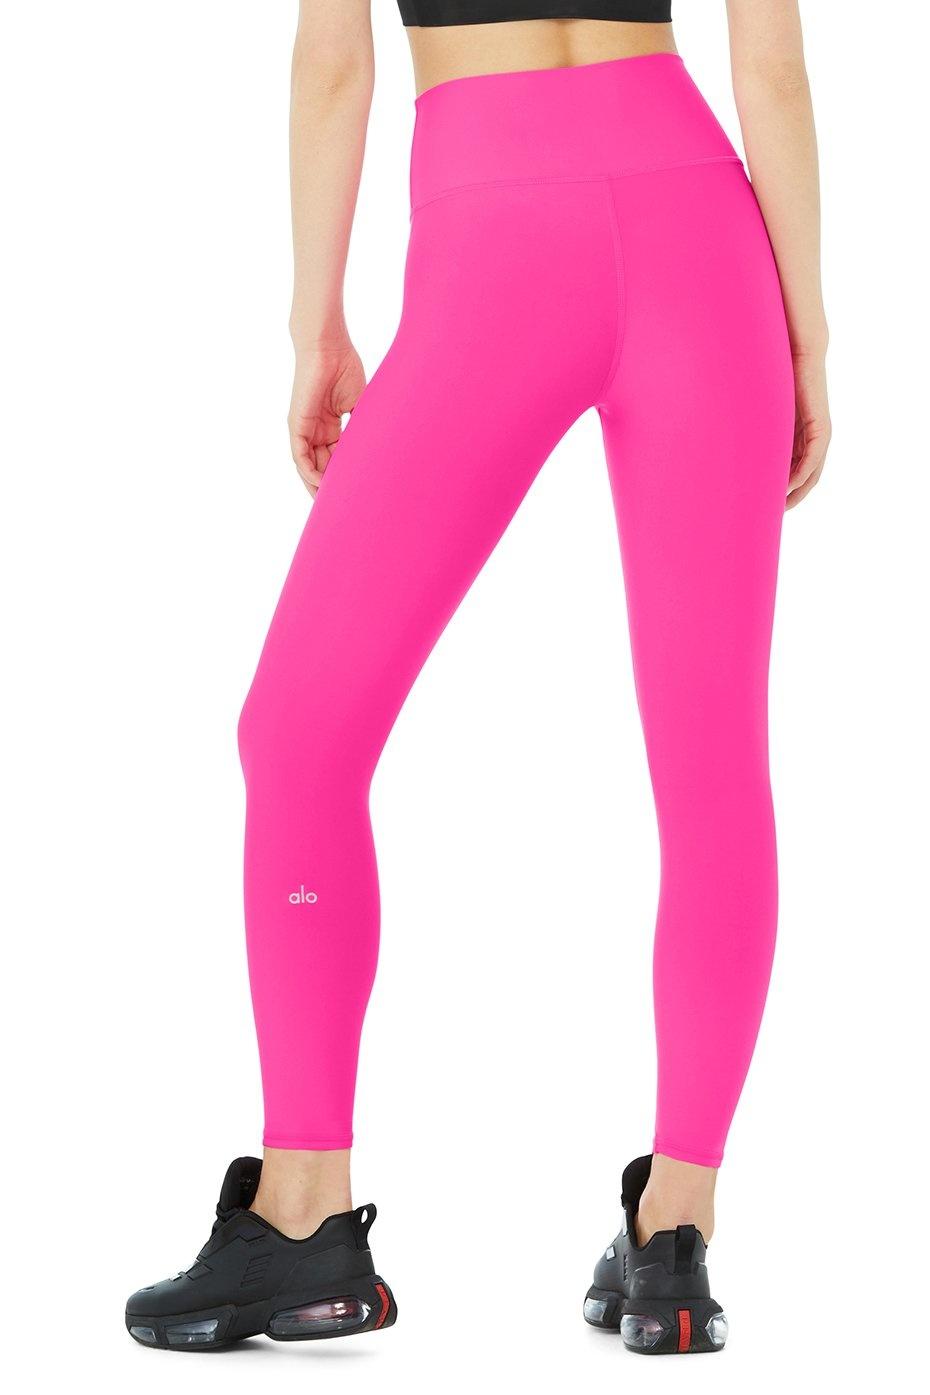 ALO 7/8 HW Airlift Legging Neon Pink